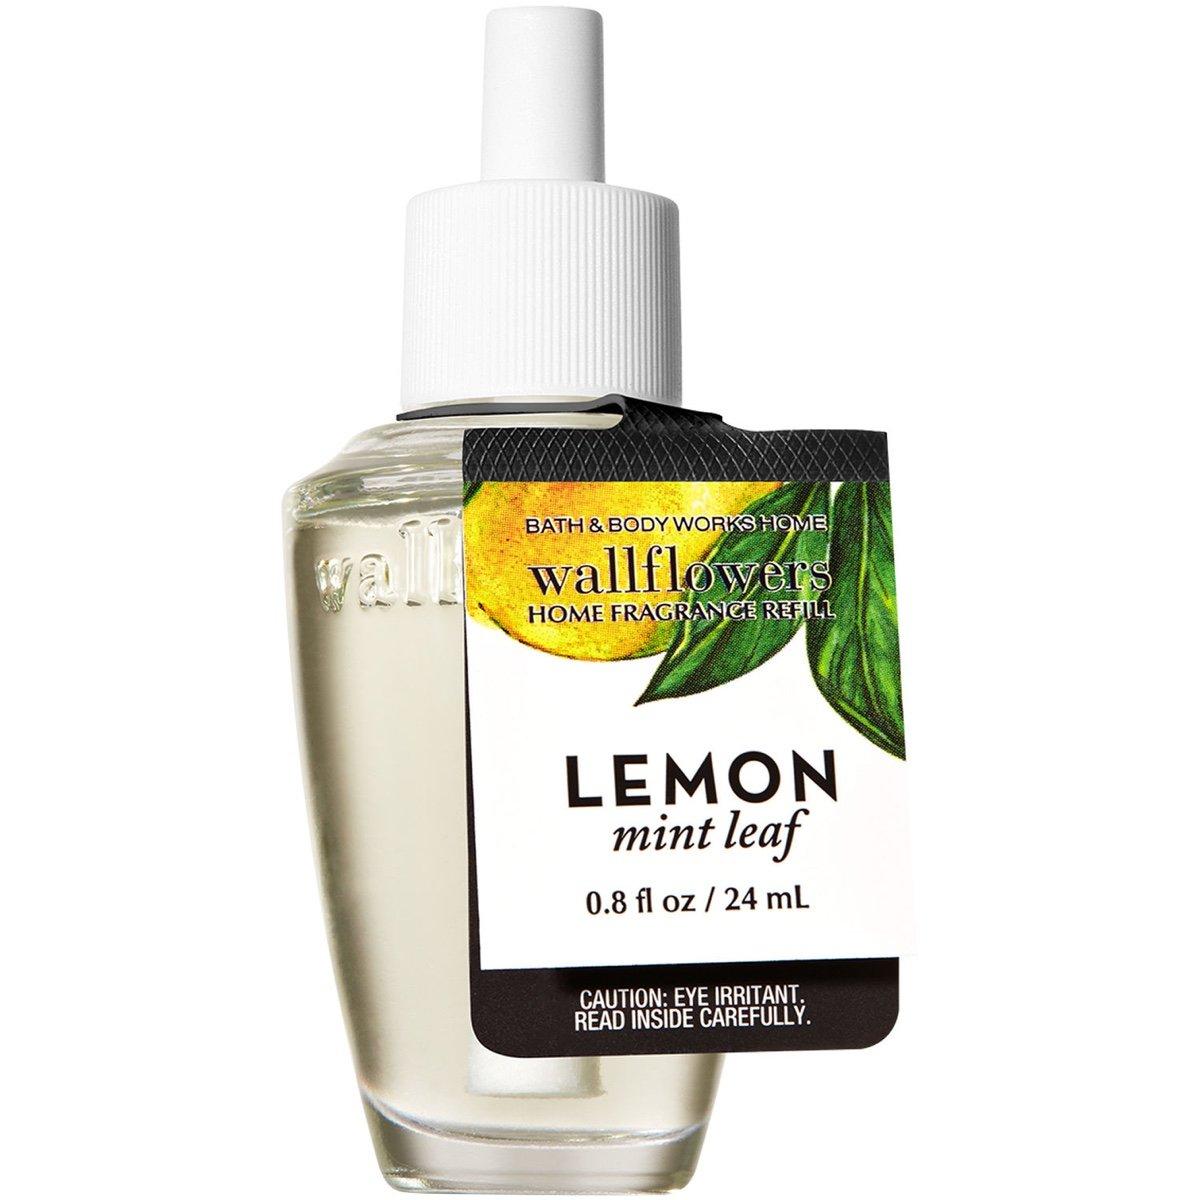 Bath and Body Works Wallflowers refill 2017 SUMMER Edition (Lemon Mint Leaf)